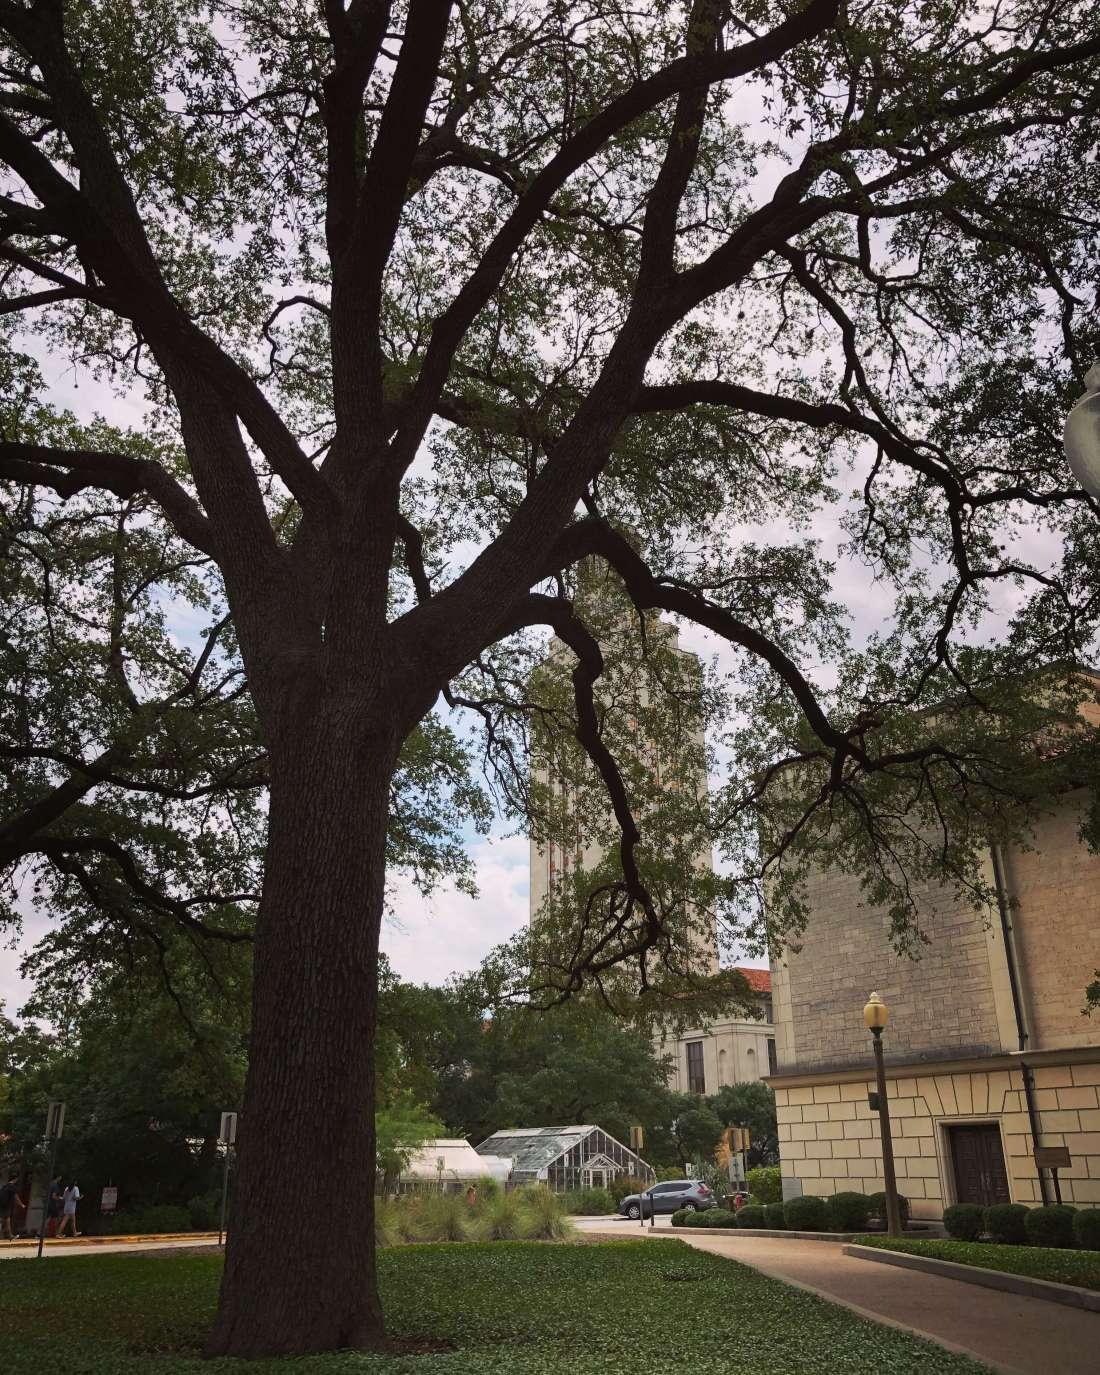 University of Texas in Austin